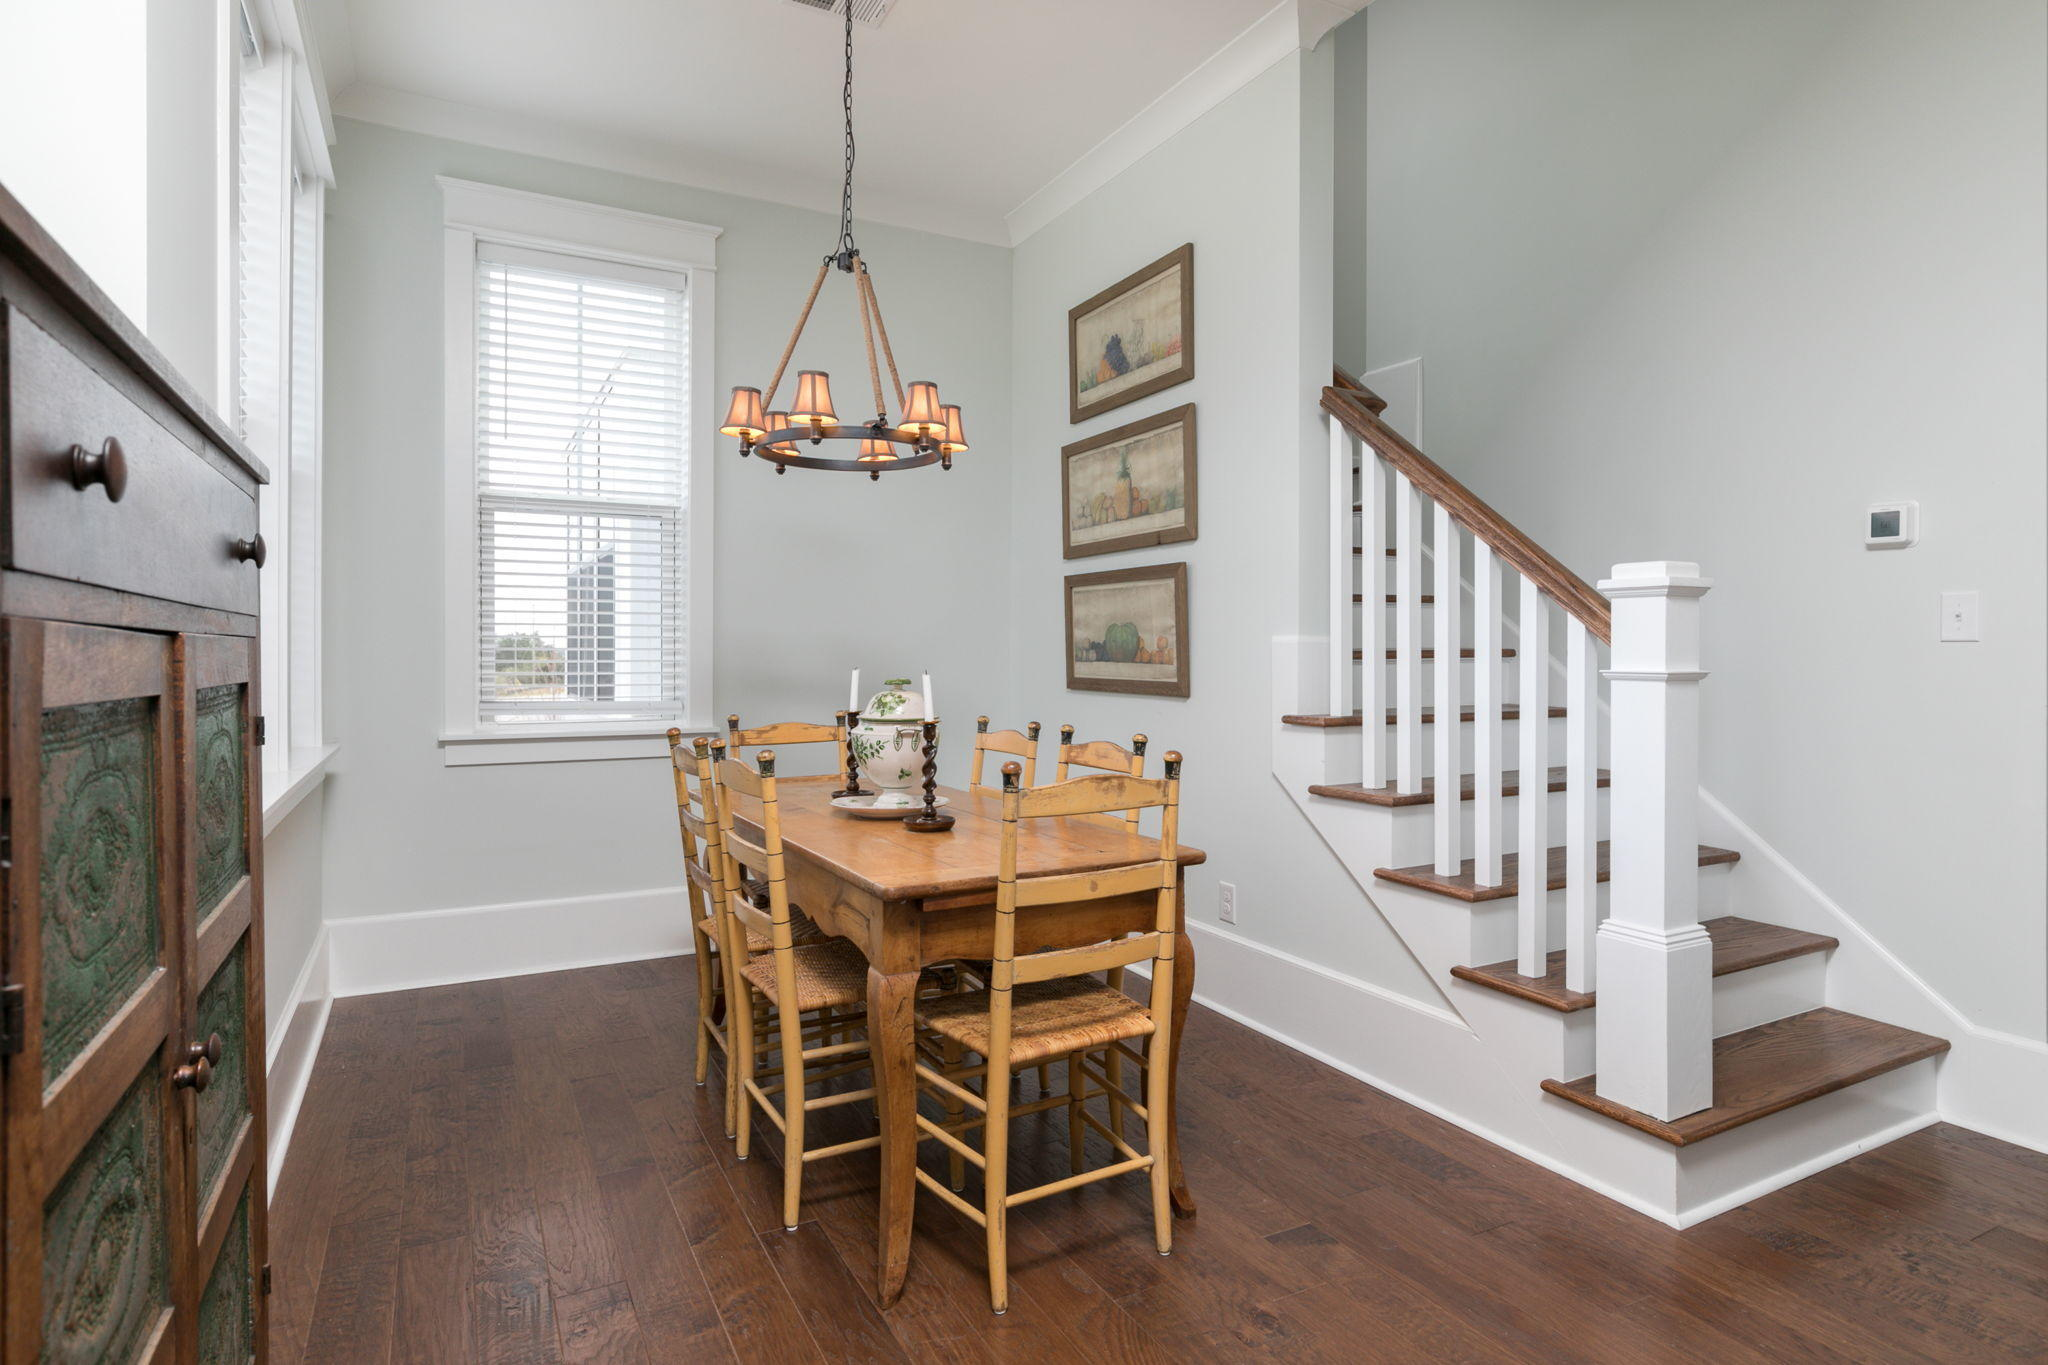 Sullivans Pointe Homes For Sale - 954 Key Colony, Mount Pleasant, SC - 23